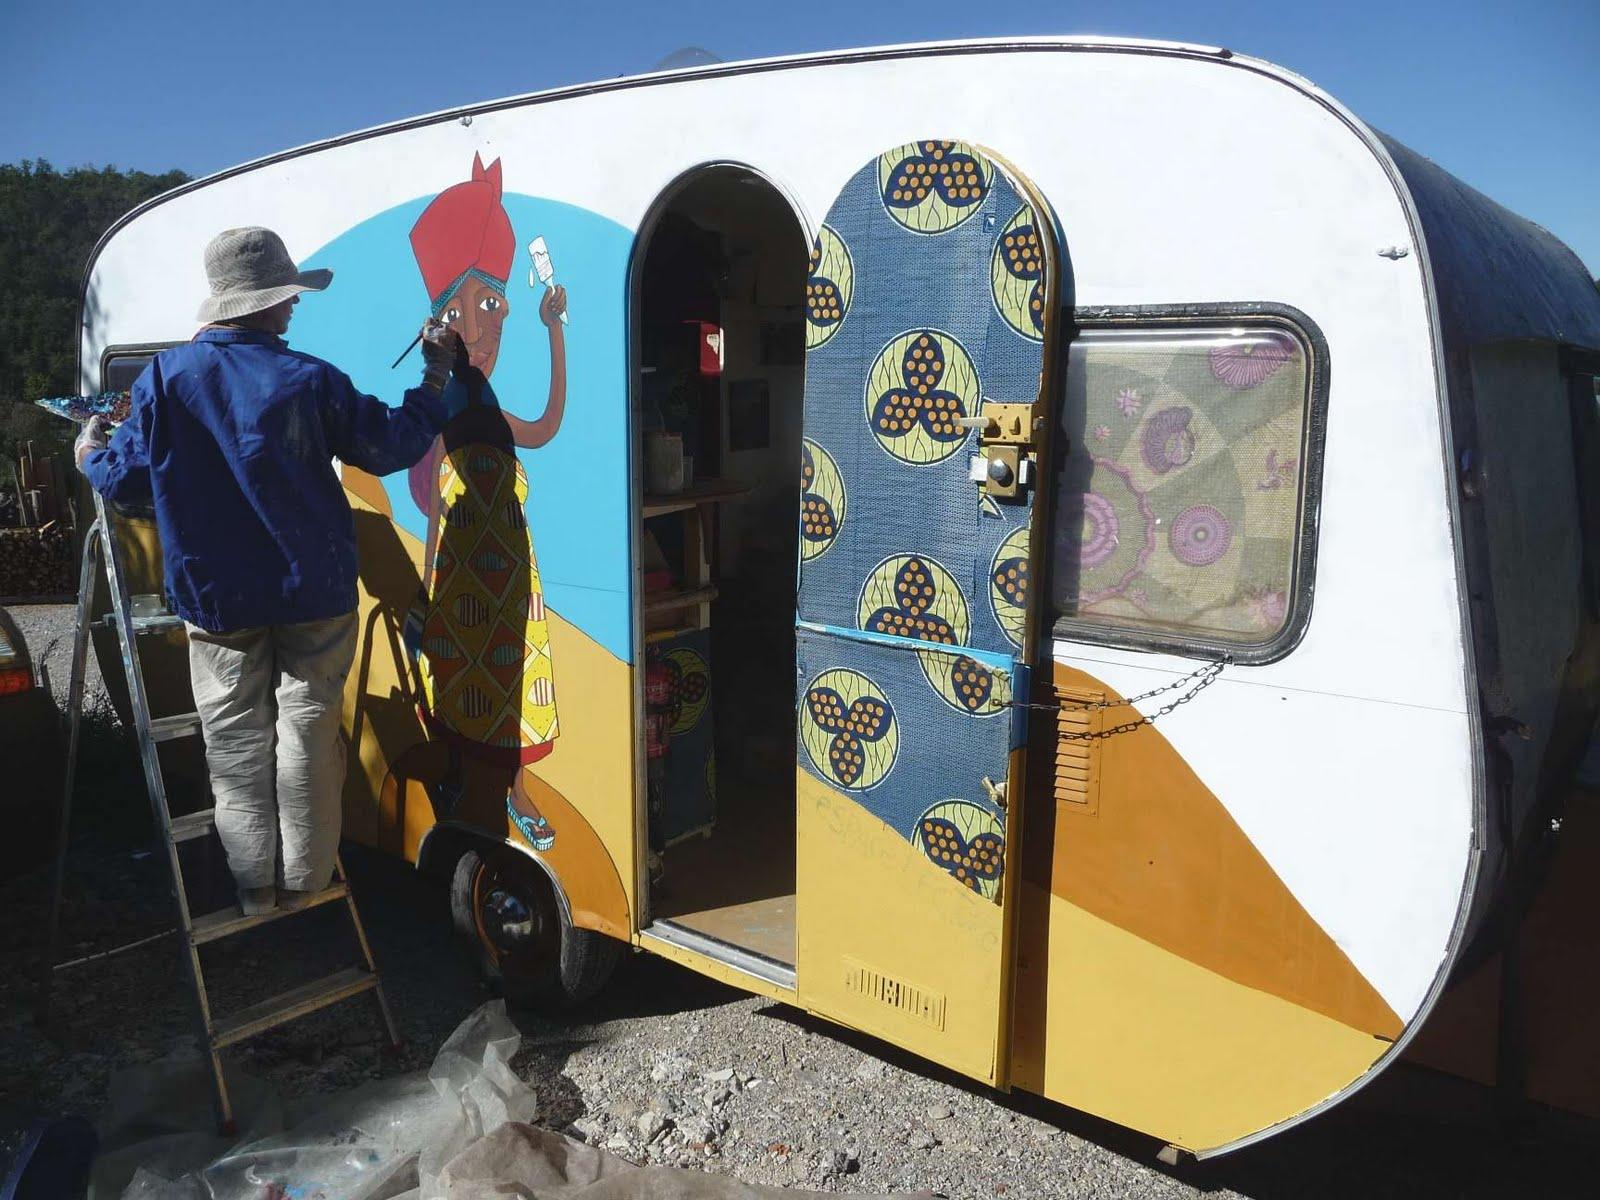 atelier des zarkyroul restauration de la caravane peinture. Black Bedroom Furniture Sets. Home Design Ideas